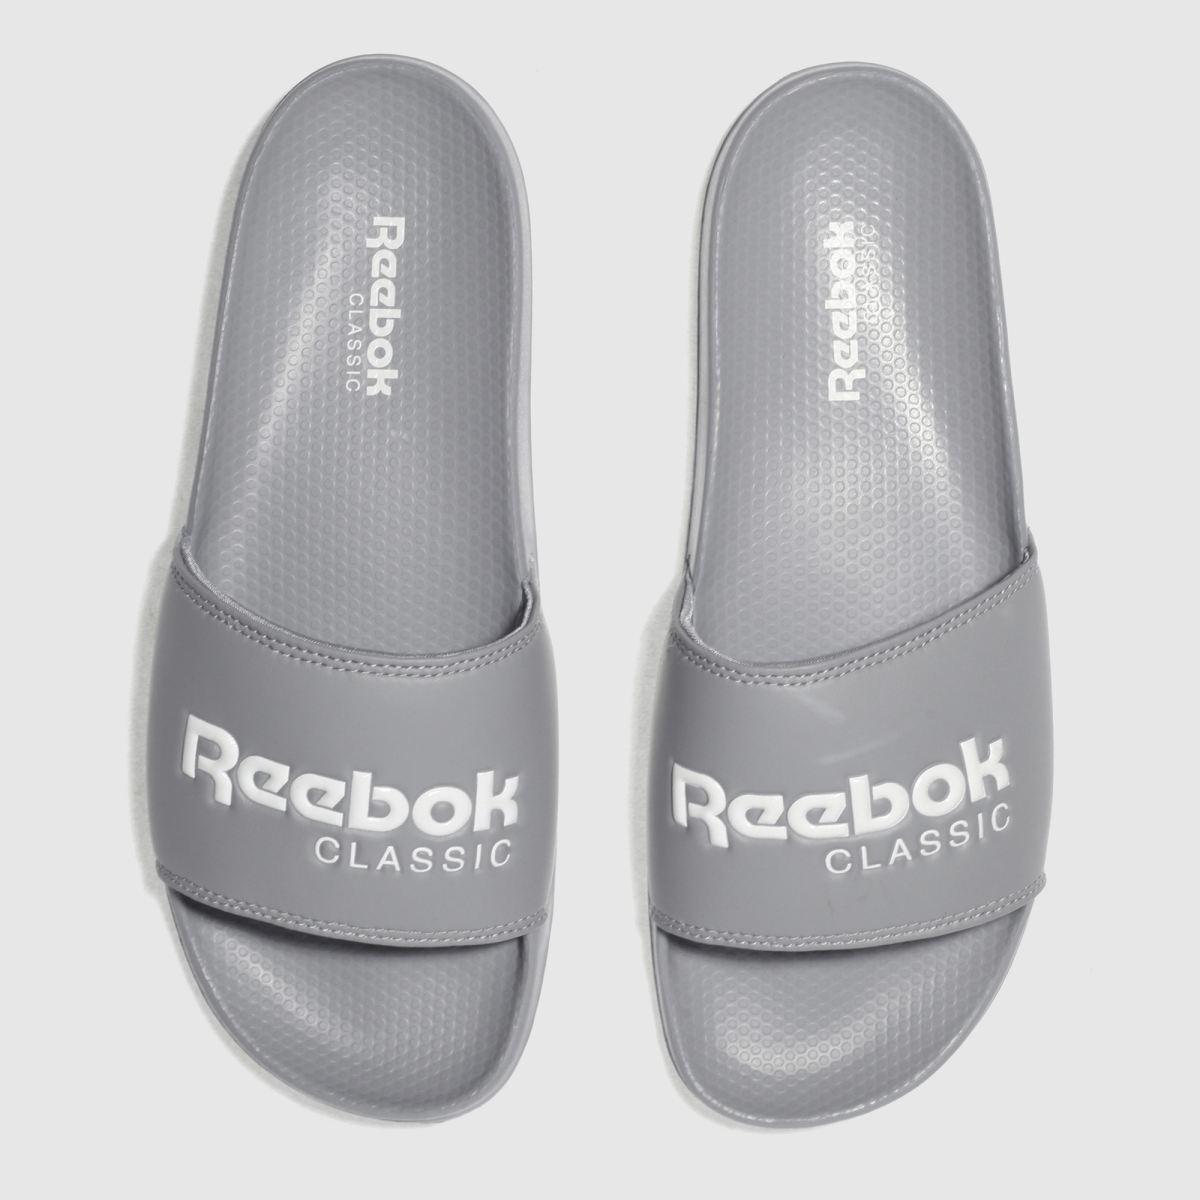 Reebok Grey Classic Slide Sandals